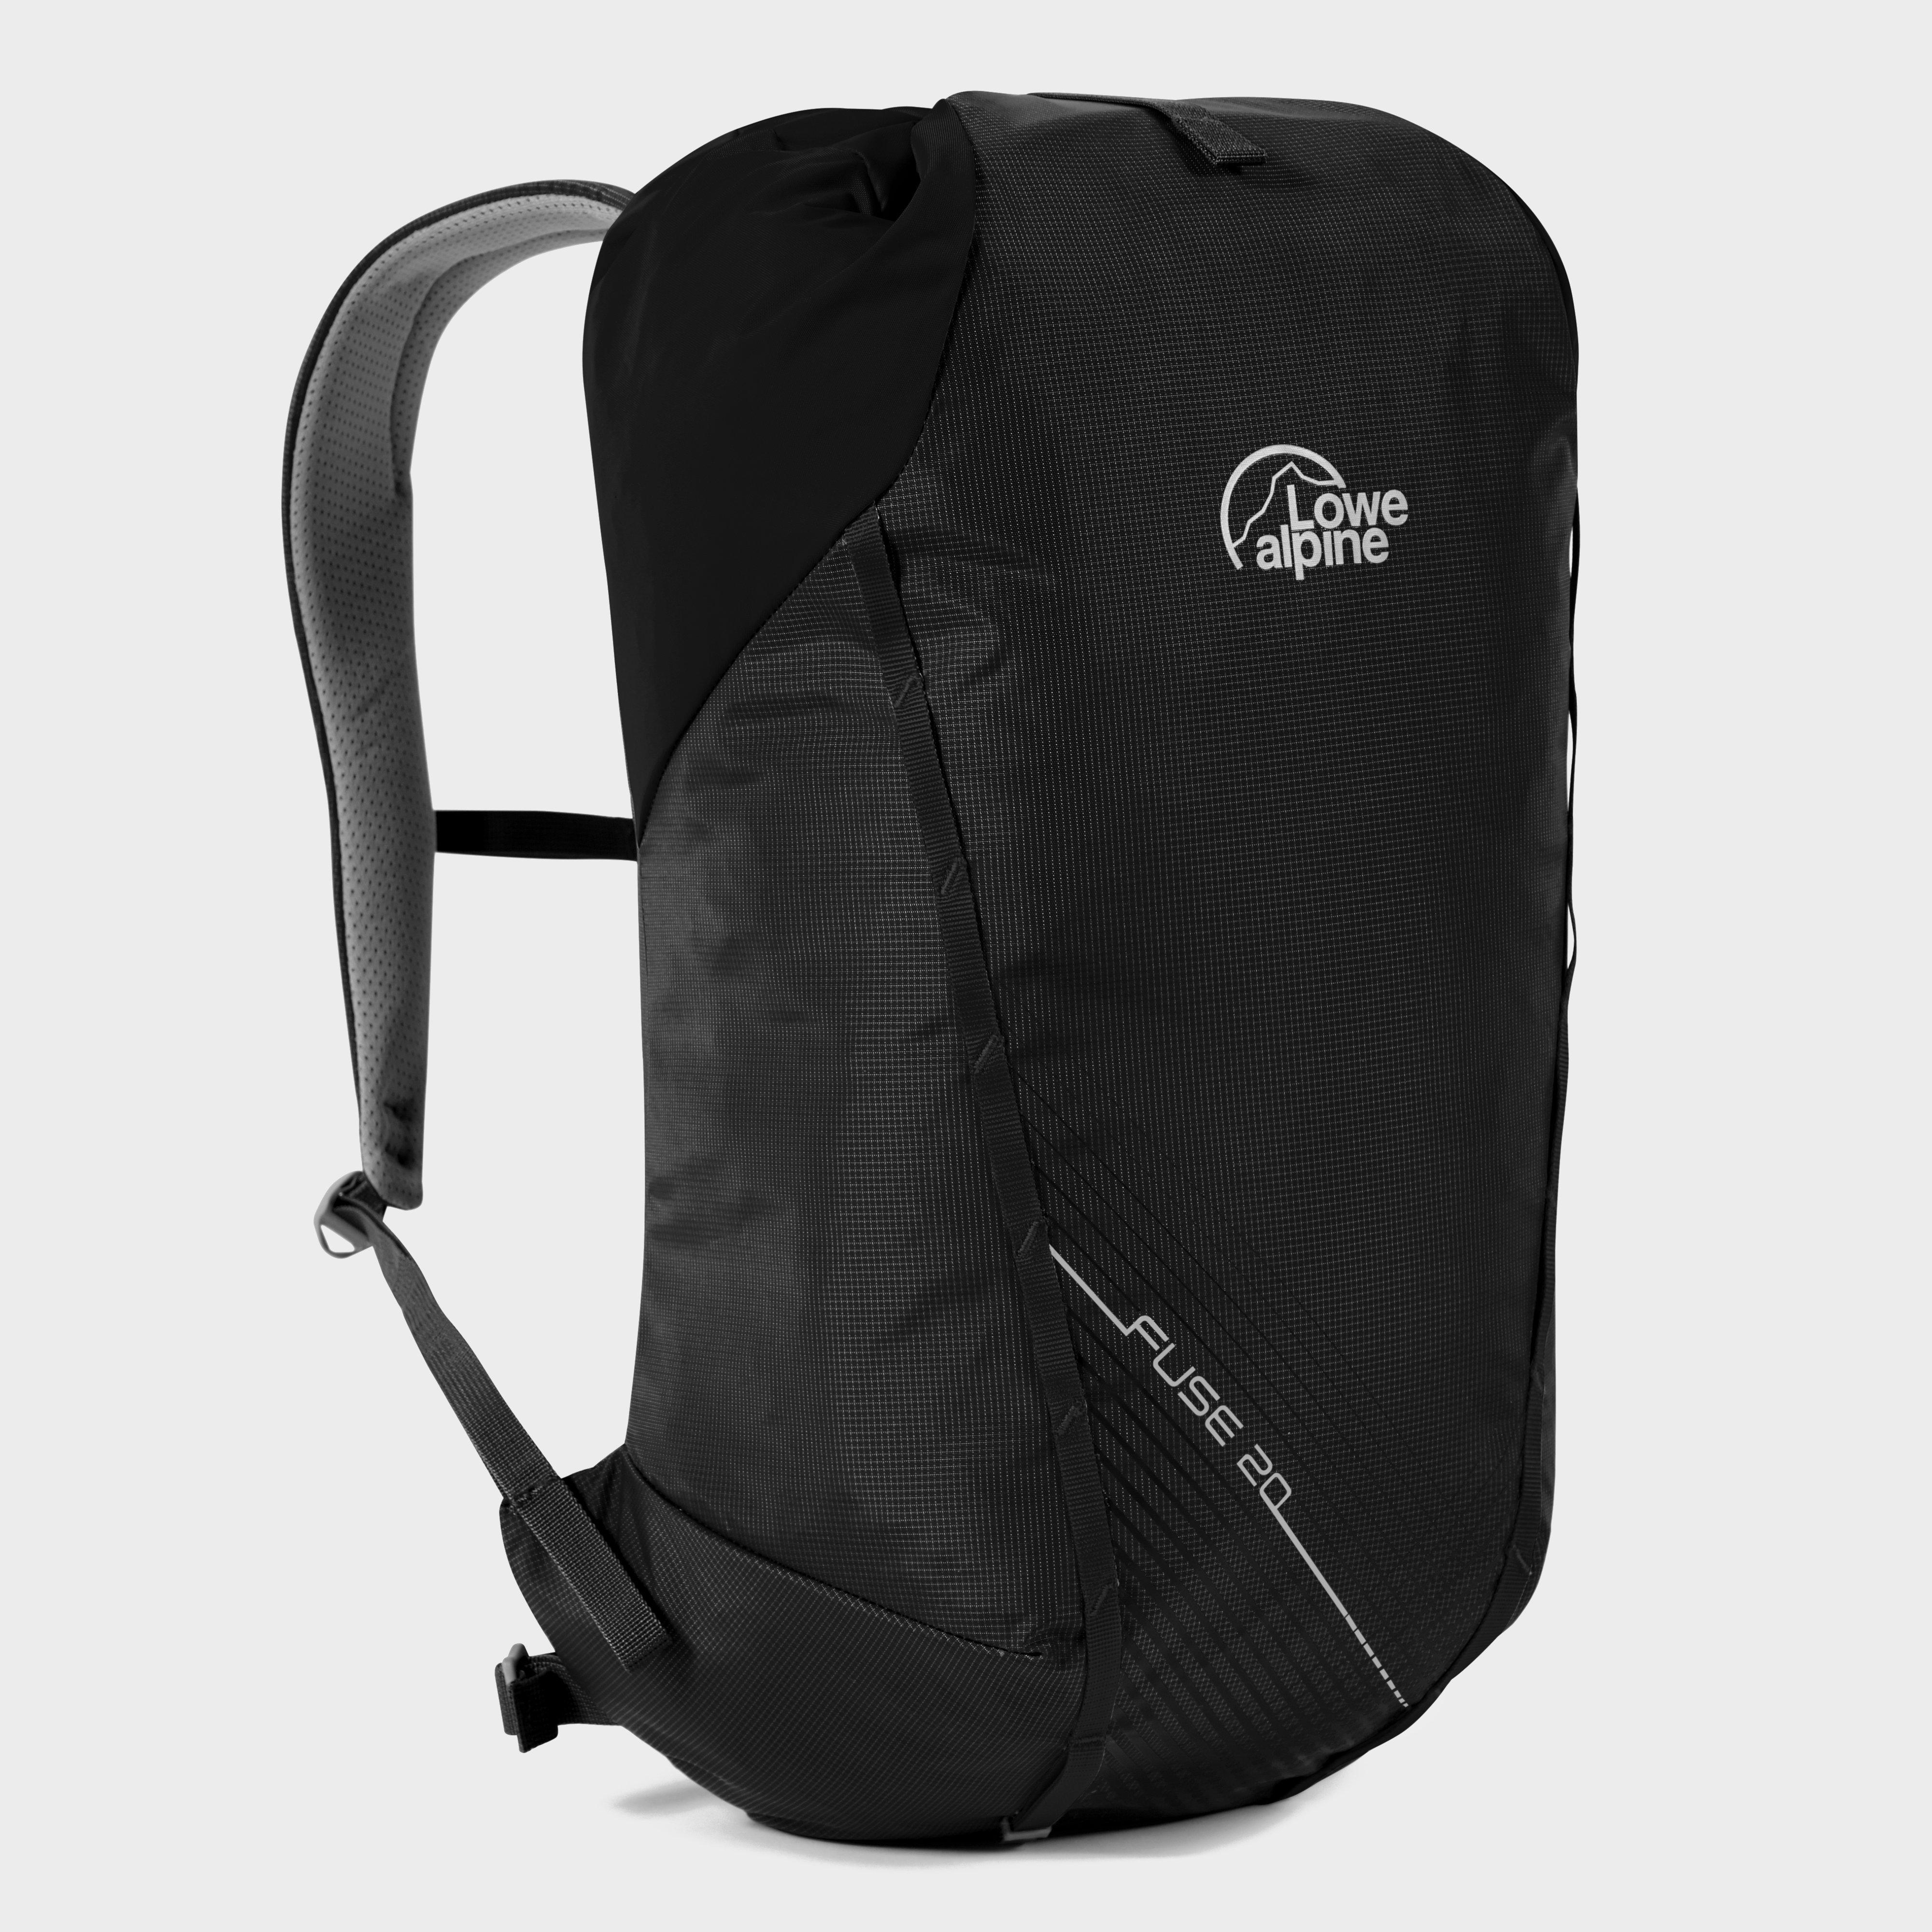 Lowe Alpine Lowe Alpine Fuse 20 Daypack - Black, Black